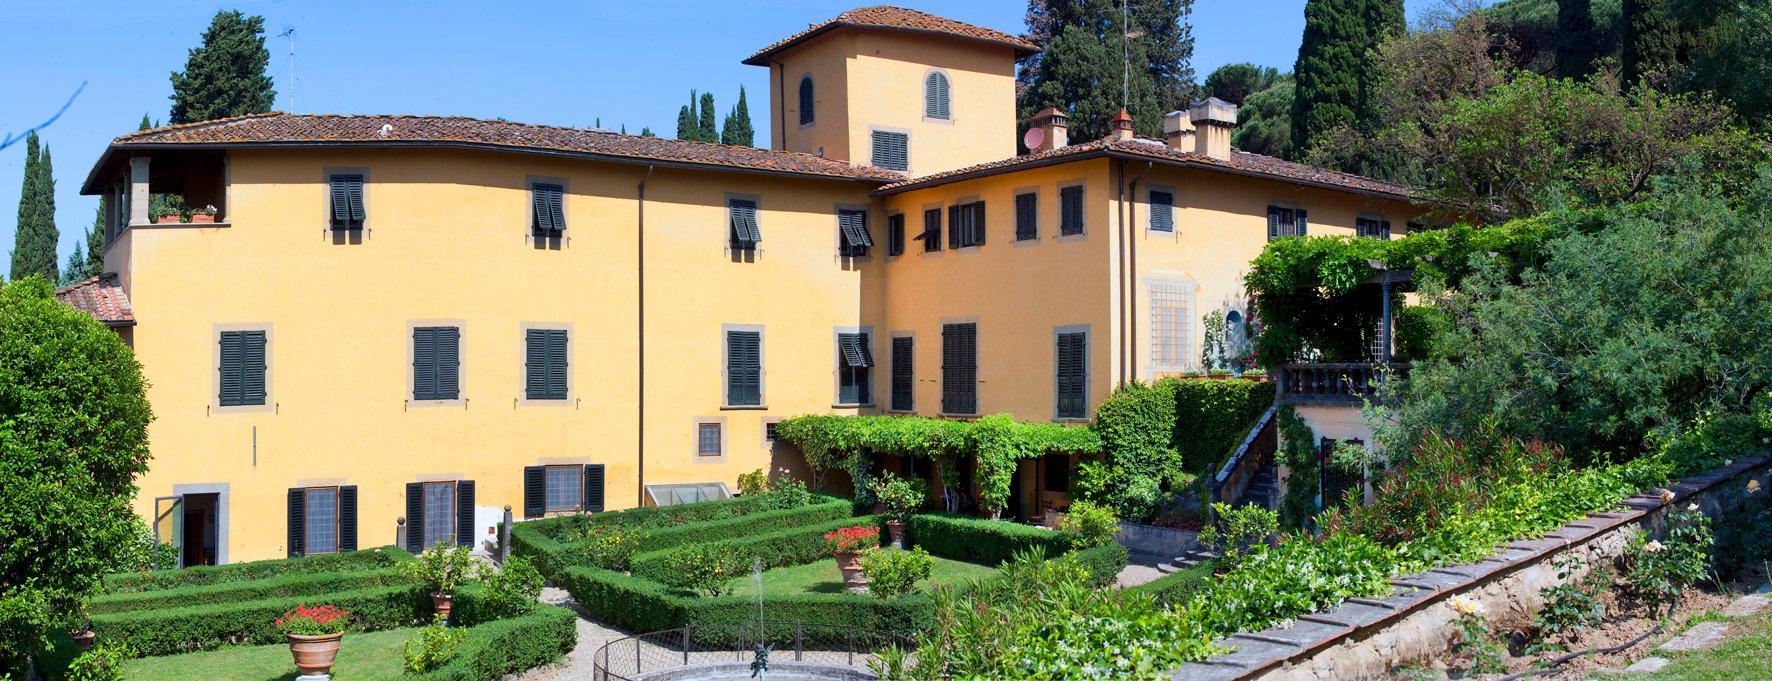 Apartment in Tuscany, Italy 1 - 10720983